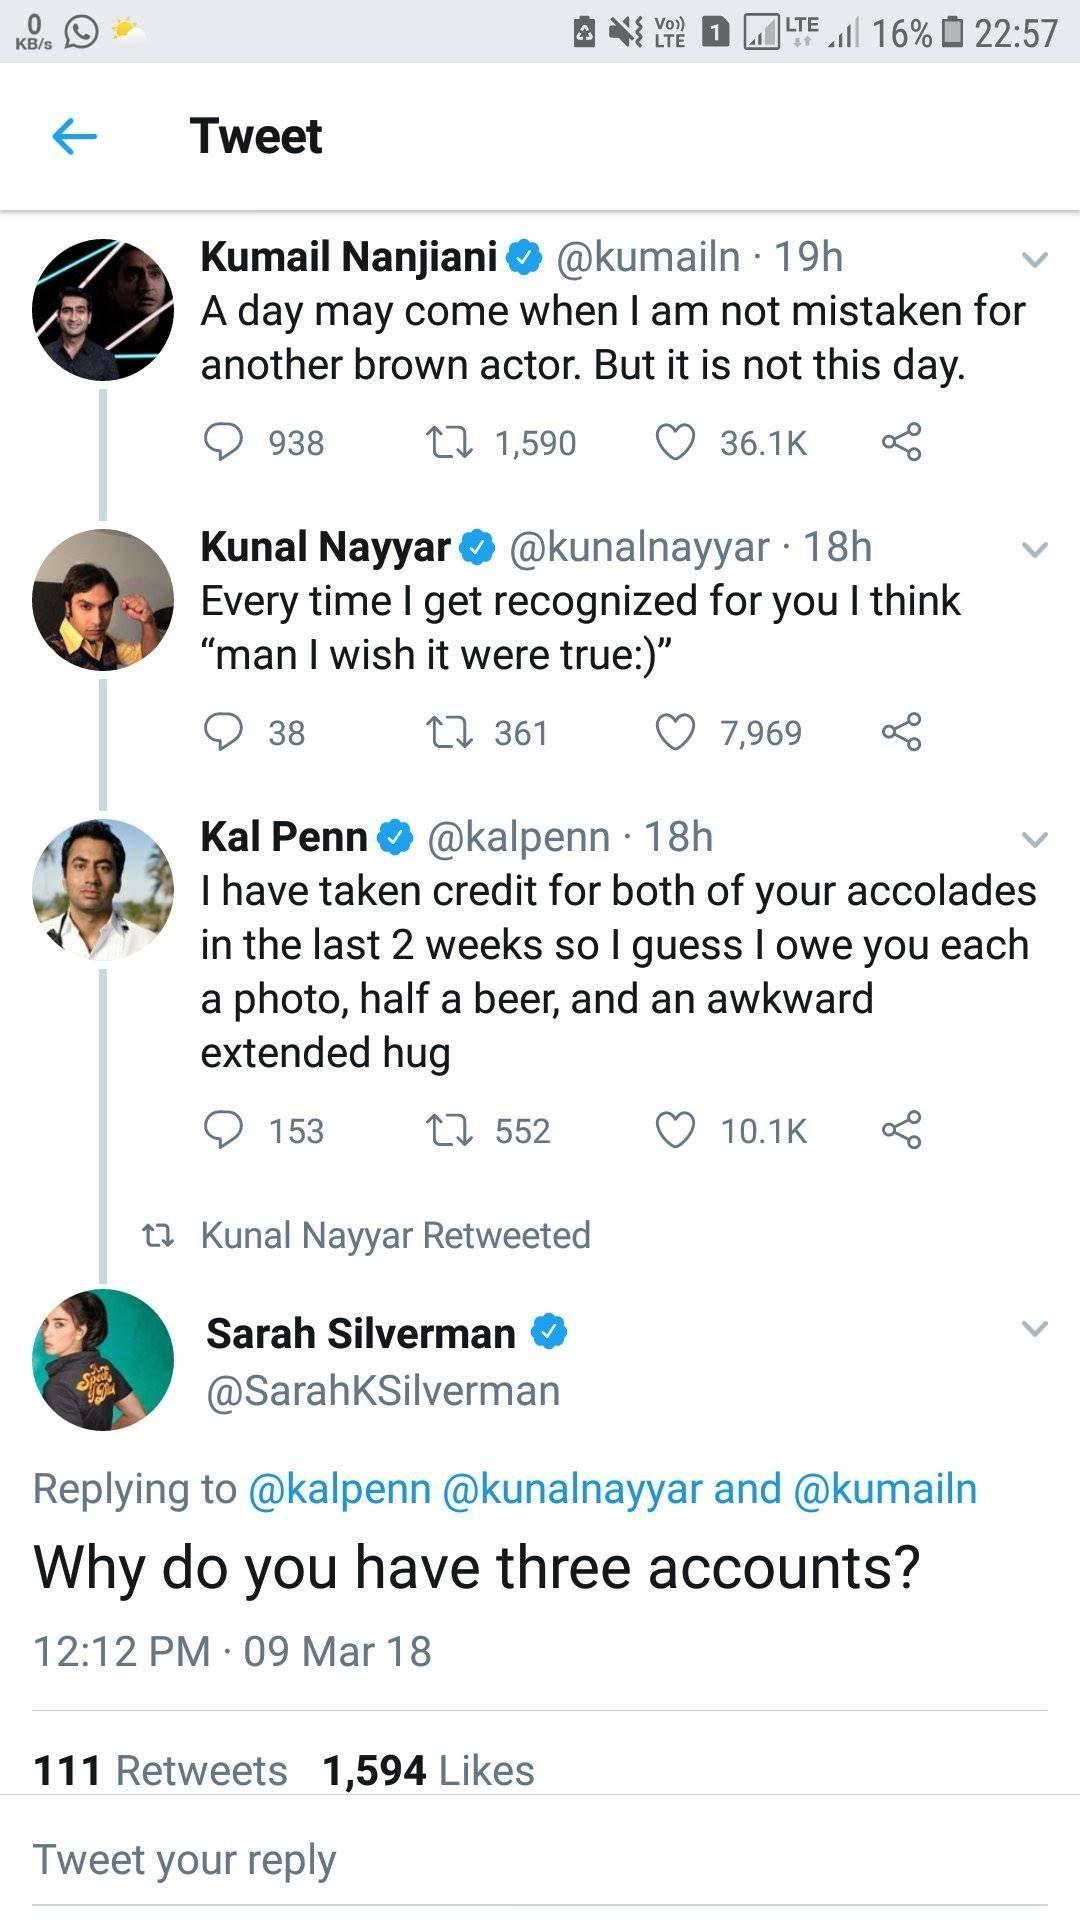 Sarah Silverman roasts an Indain guy. Three times.